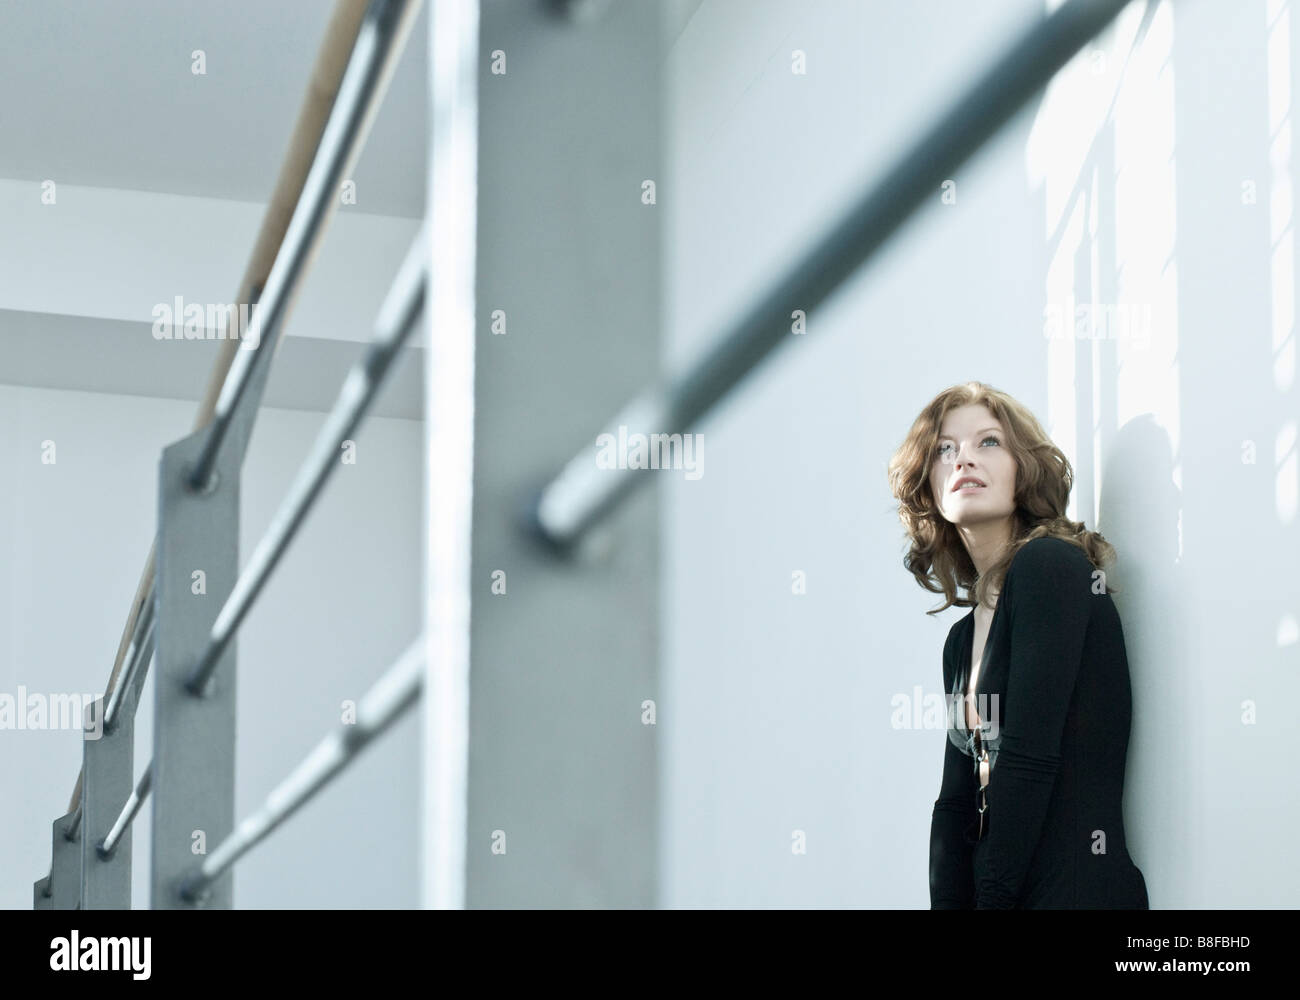 Young woman leaning against wall tout en regardant vers le haut Photo Stock